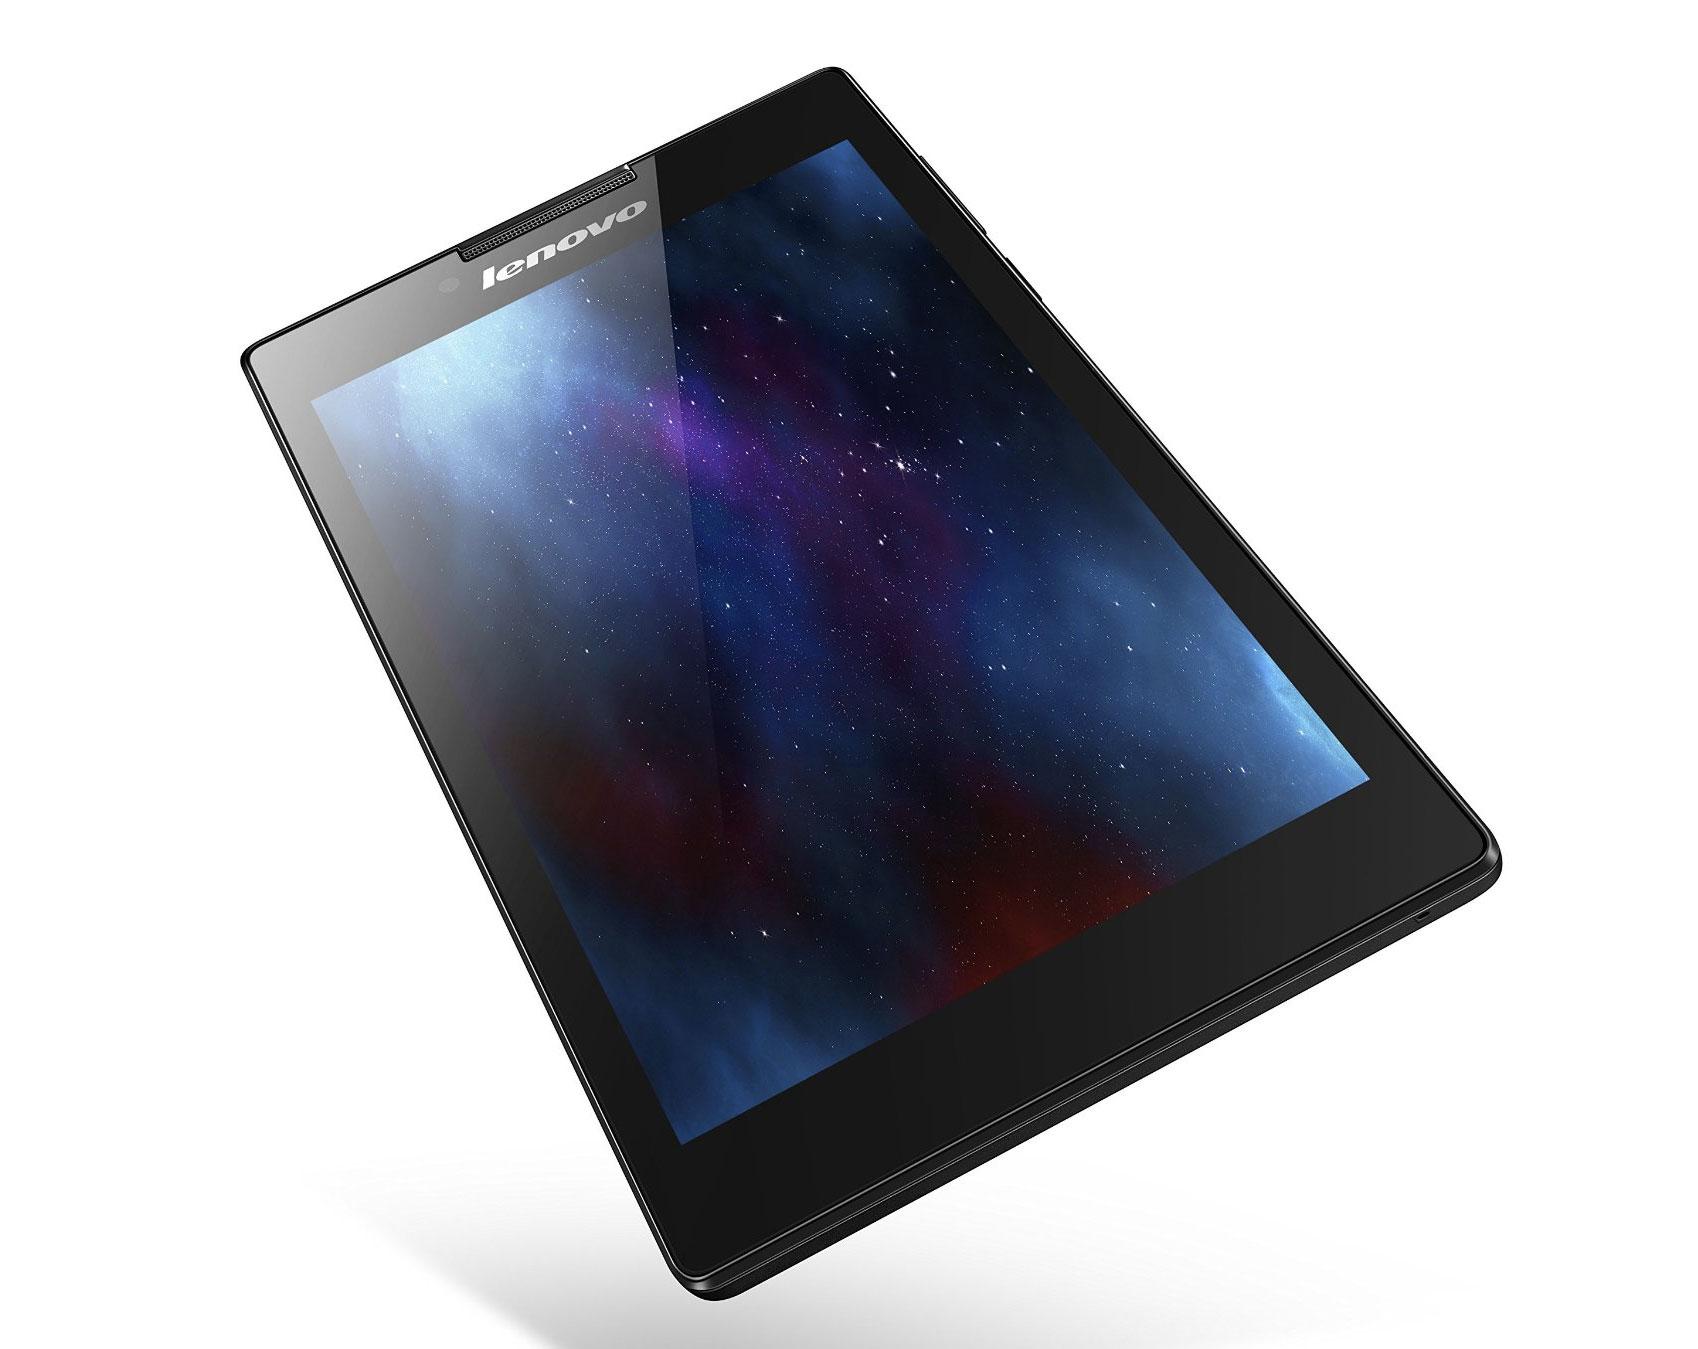 🔥 Vente flash : La Lenovo Tab 2 A7-30 à 59 euros